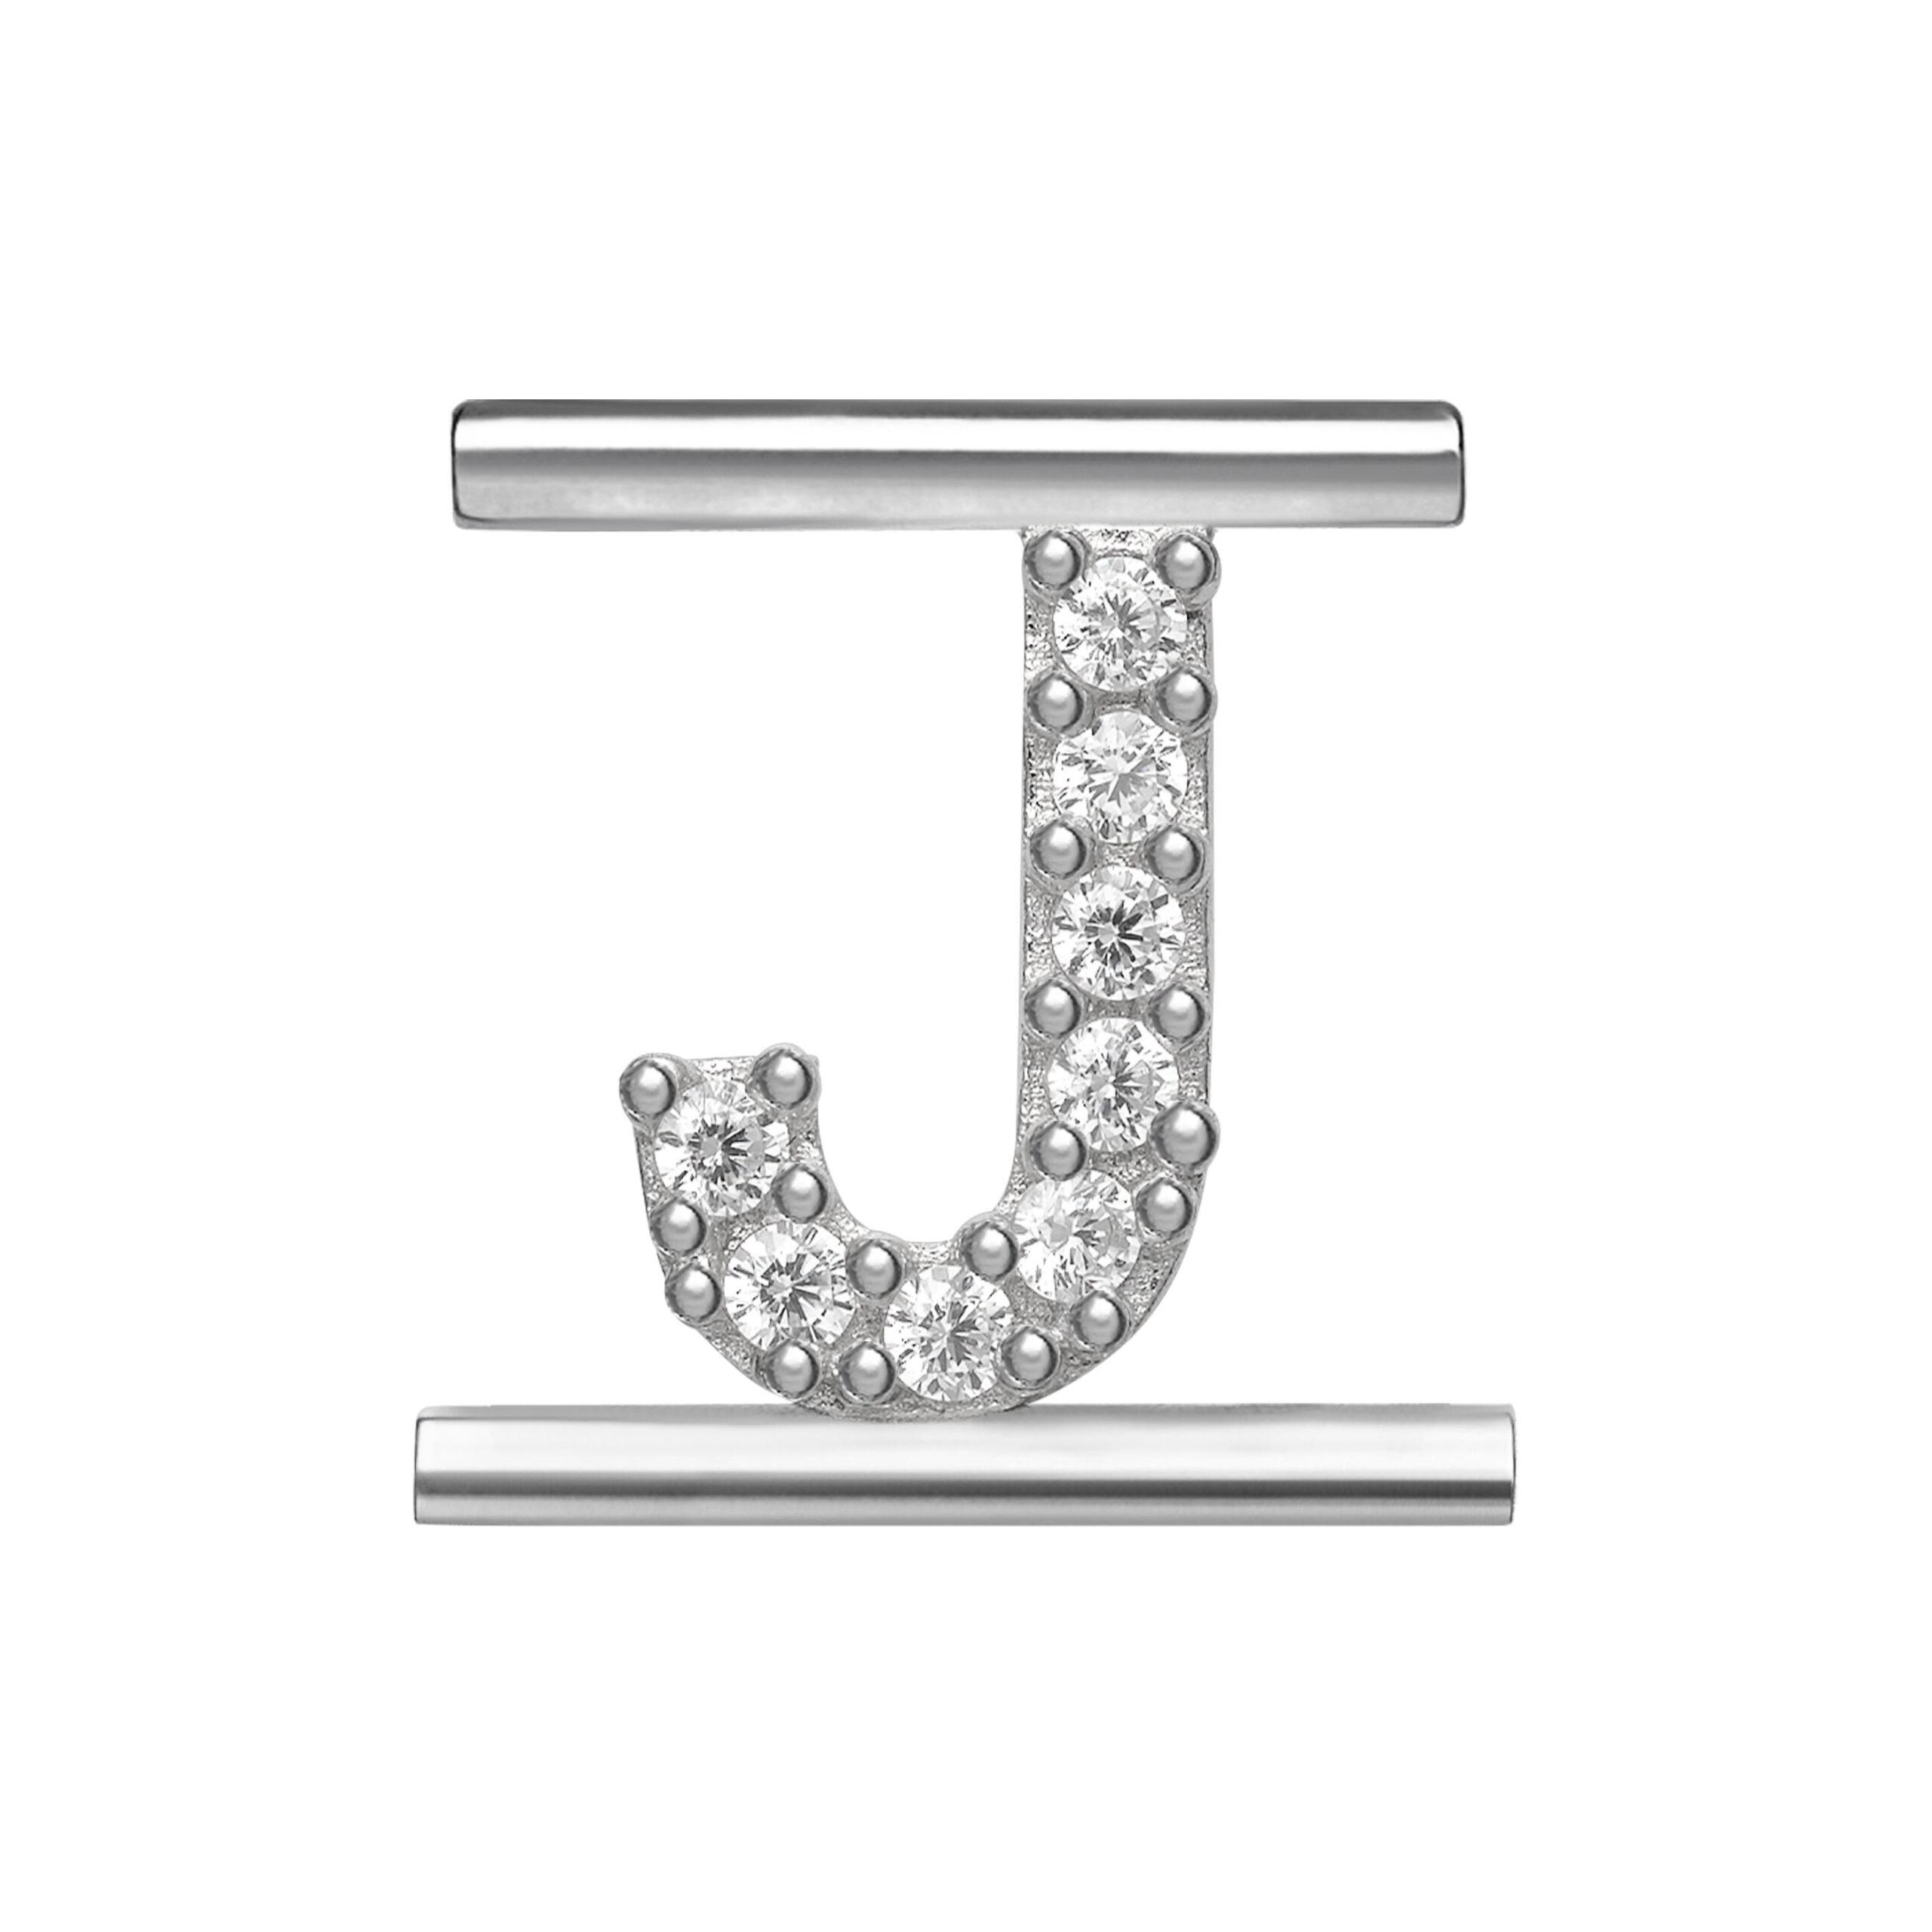 ELEONORA GIORDANI Argento Elementi J